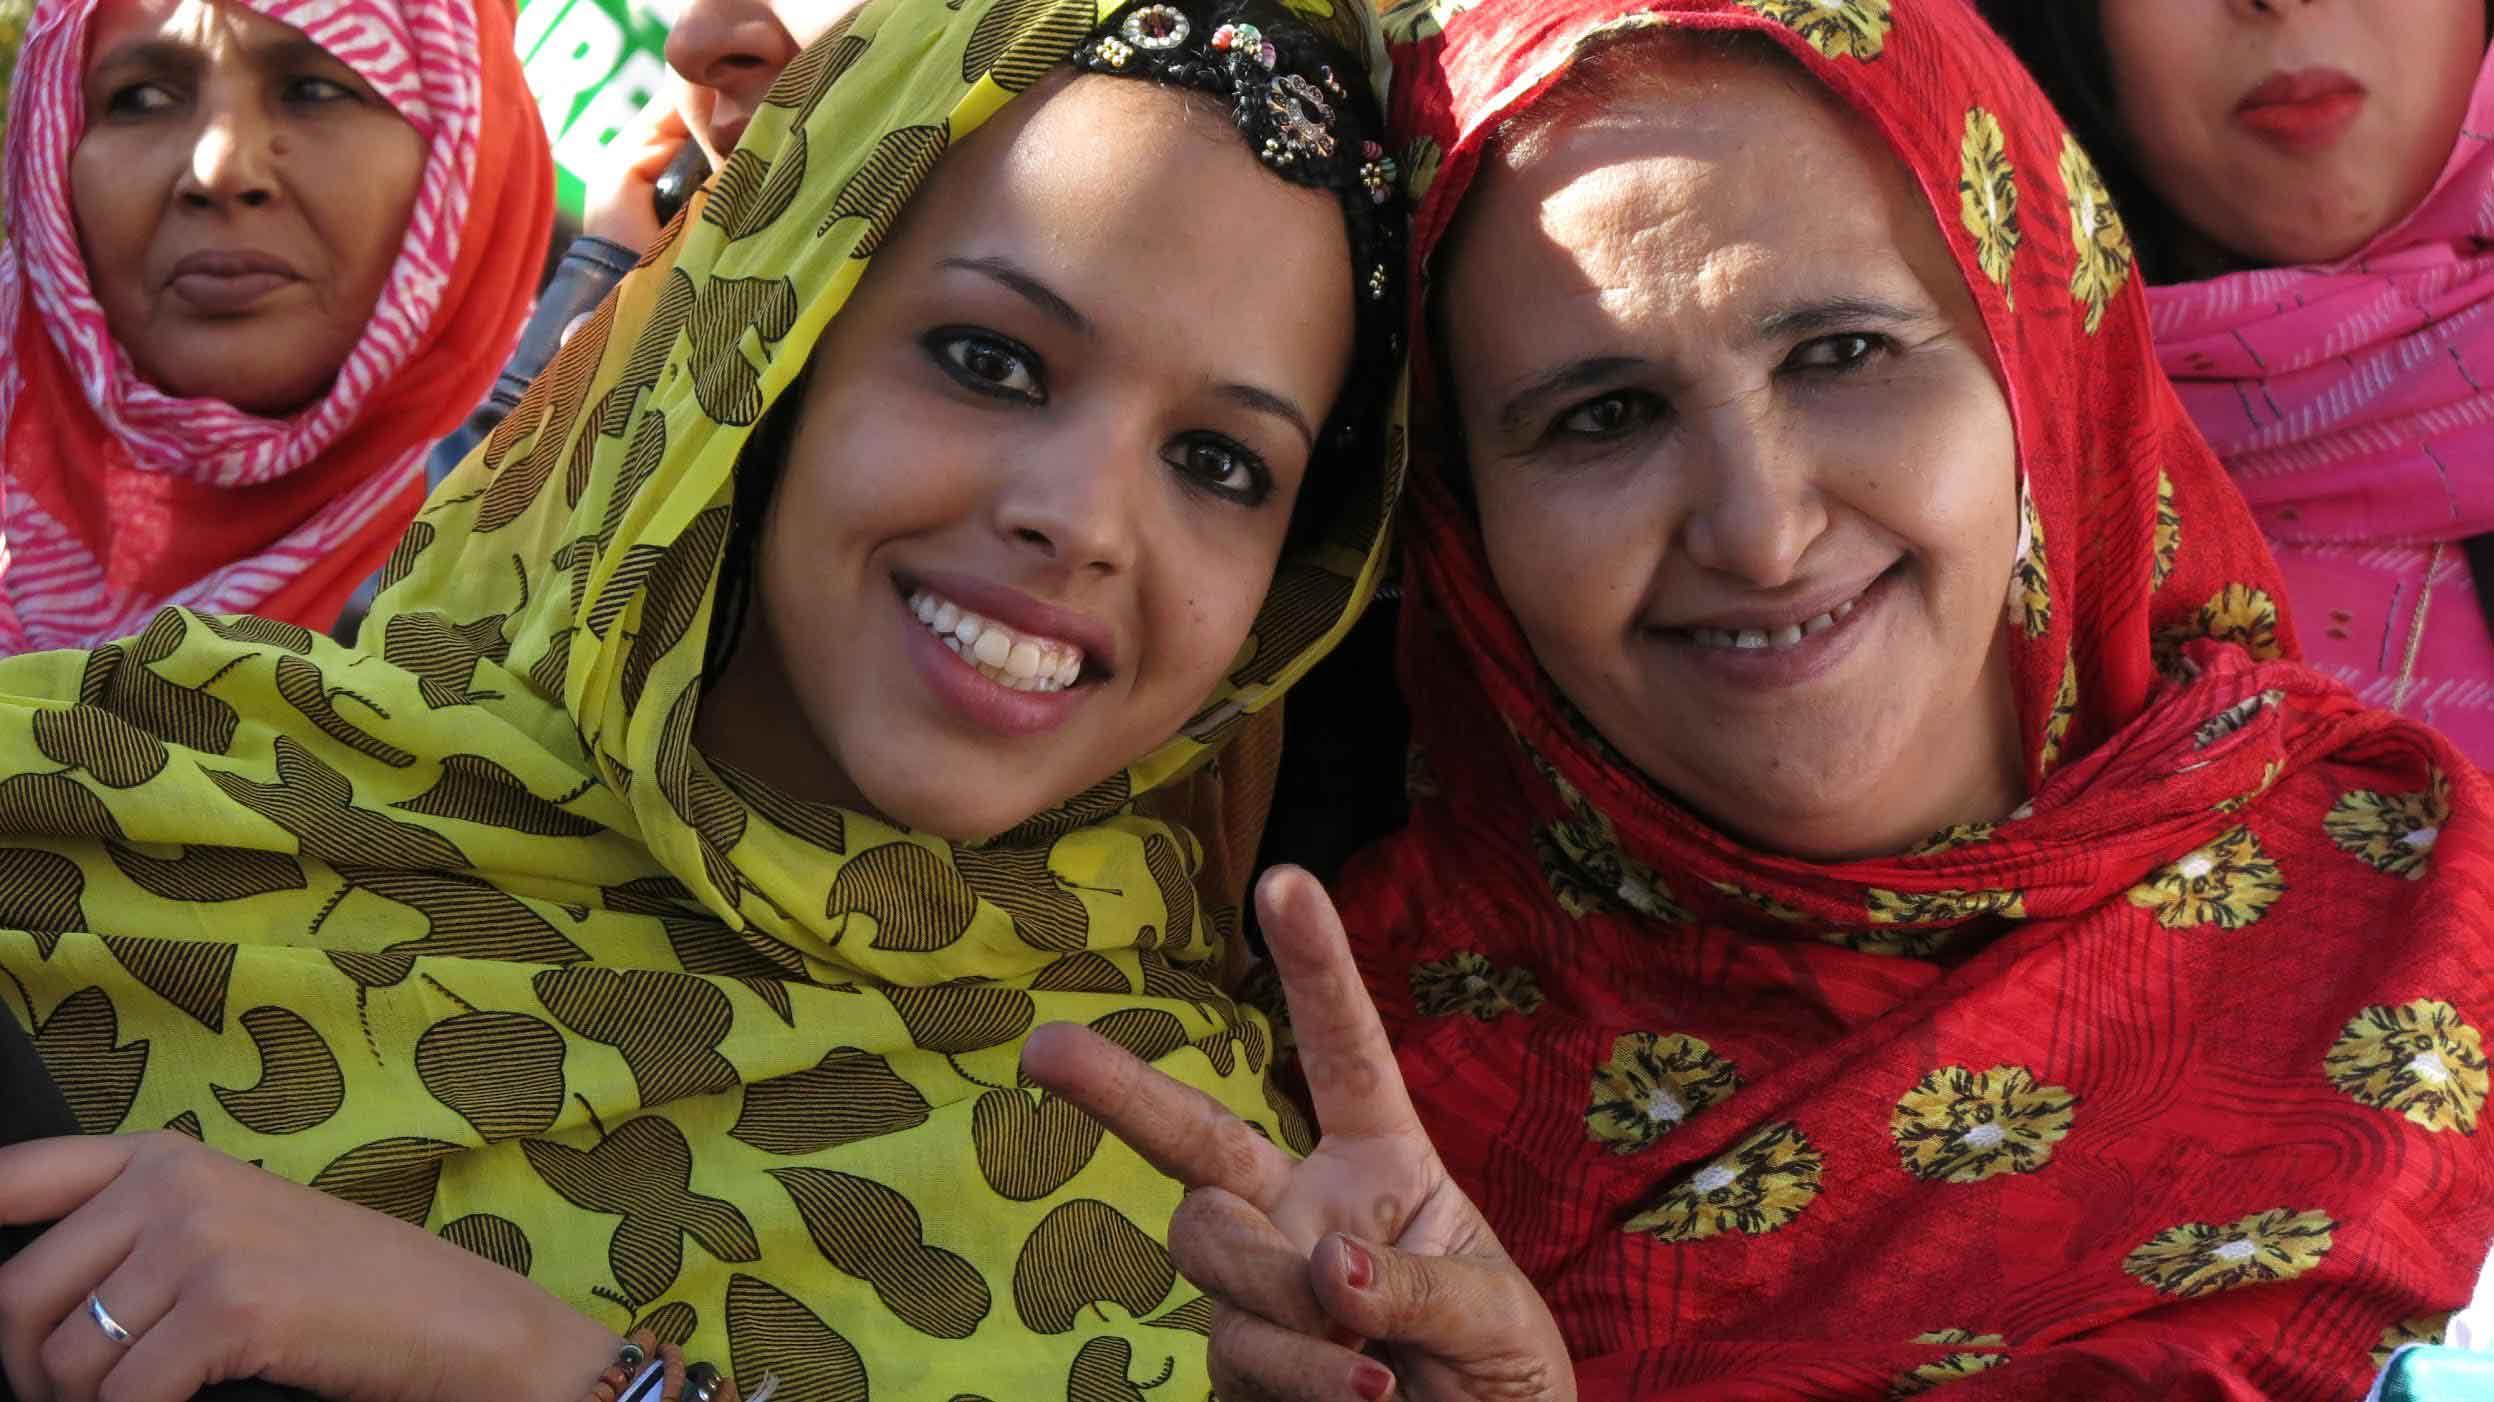 Il docufilm di Iara Lee sul popolo sahrawi